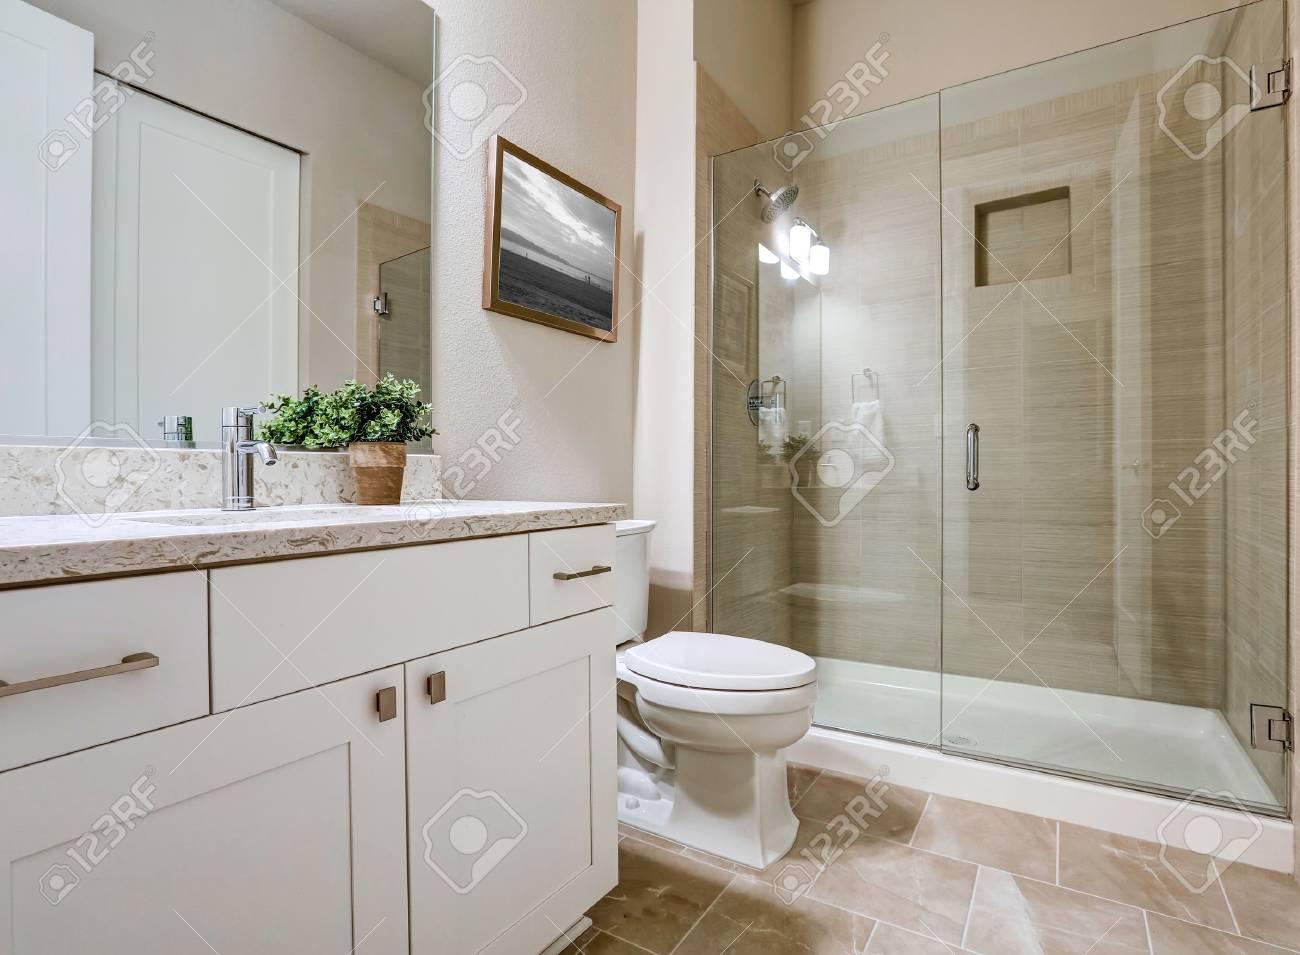 Astonishing Transitional Bathroom Interior Design In Soft Beige Colors Features Download Free Architecture Designs Pushbritishbridgeorg